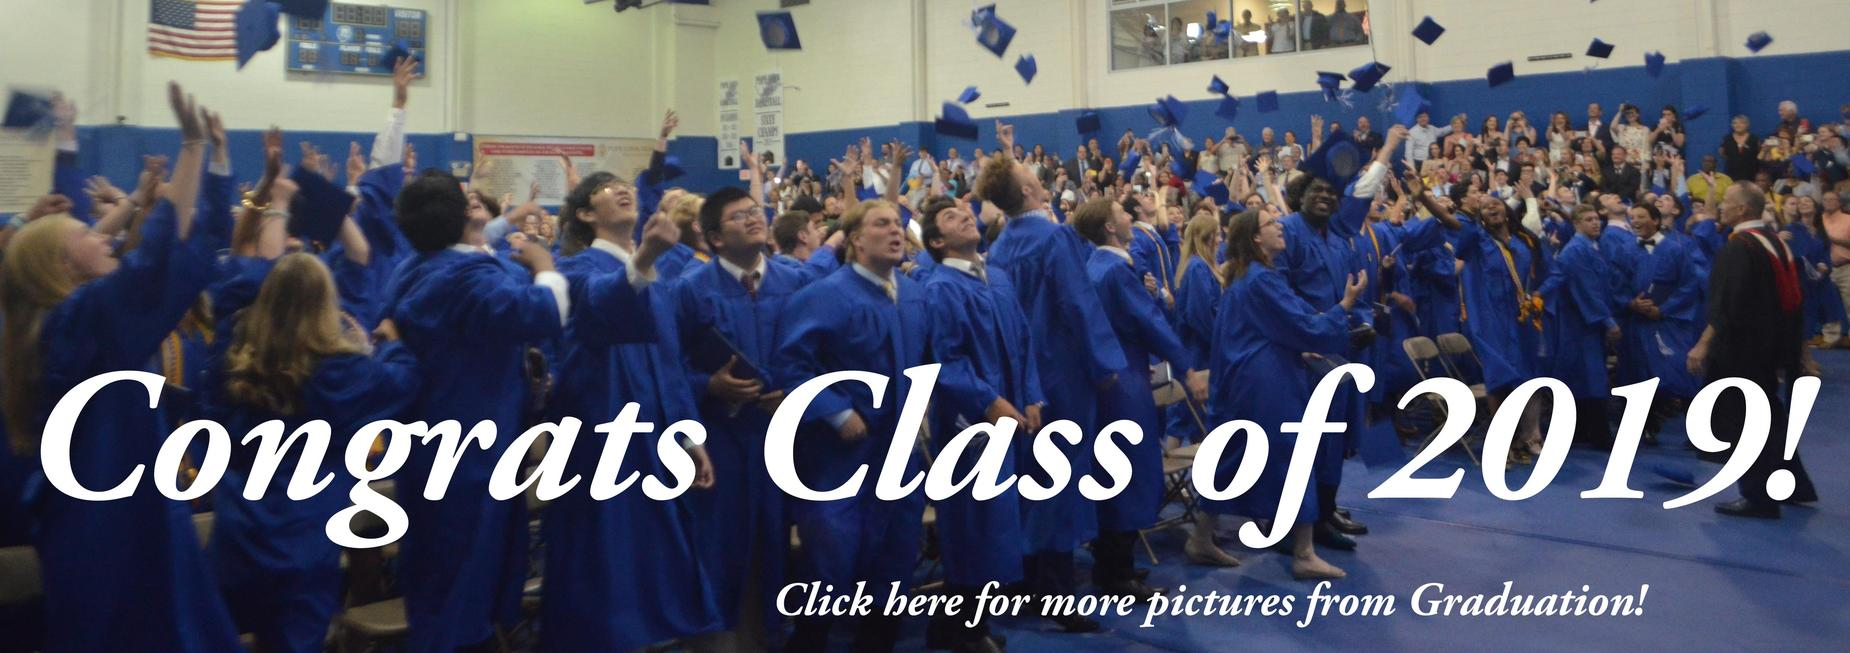 Class of 2019 Congrats